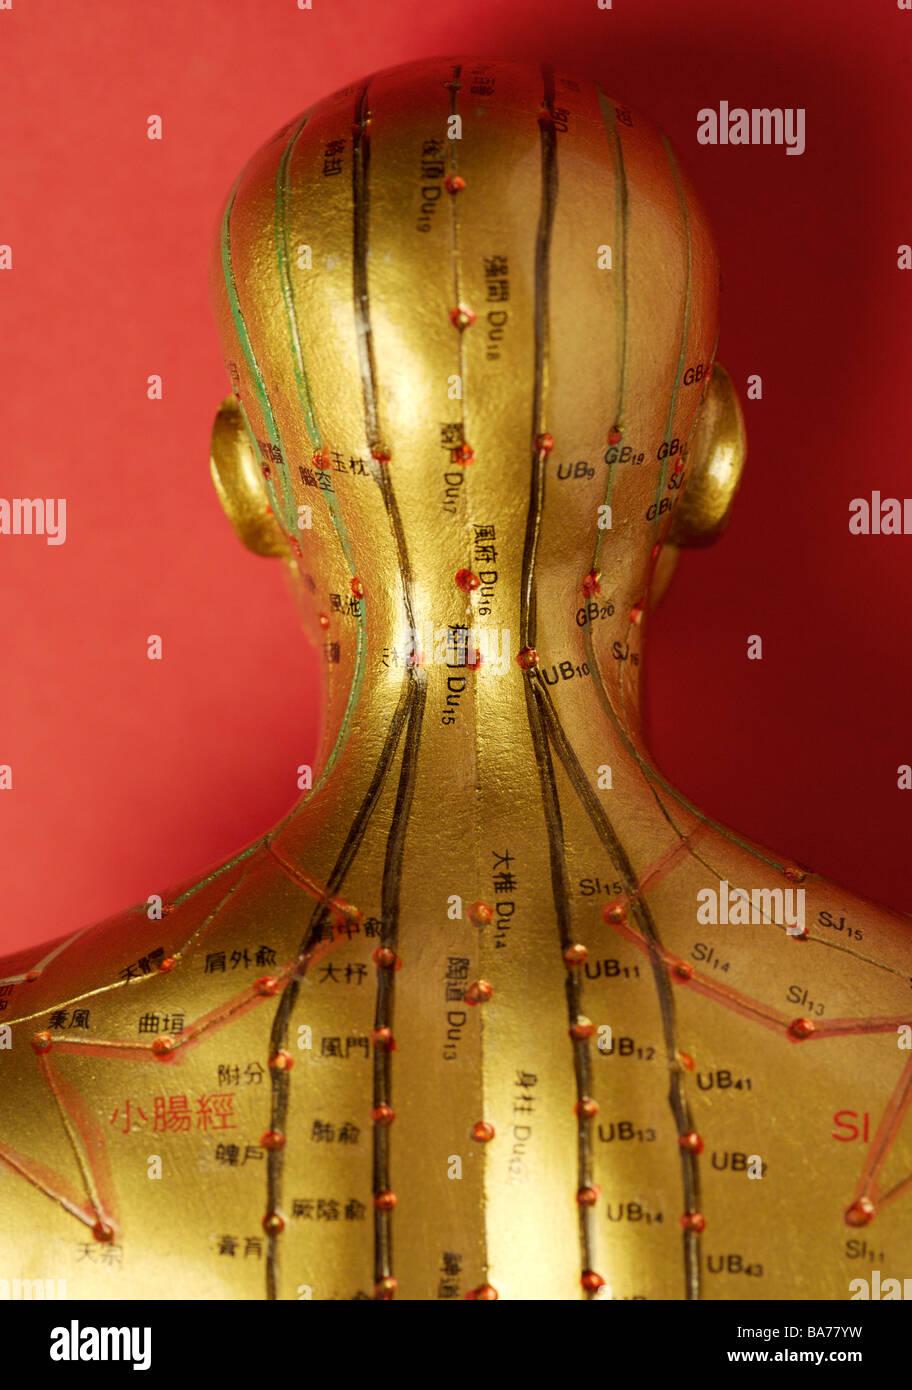 Model Human Head Acupuncture Points Stockfotos & Model Human Head ...